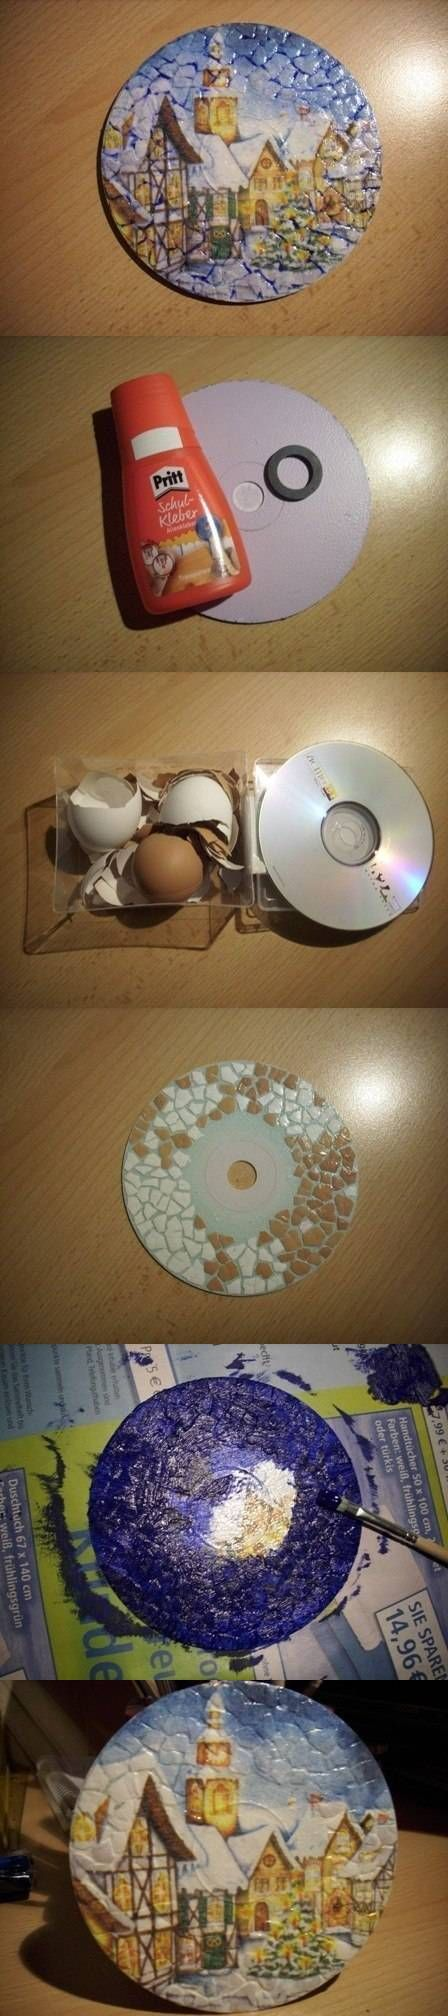 DIY Eggshell Decoupage DIY Projects | UsefulDIY.com